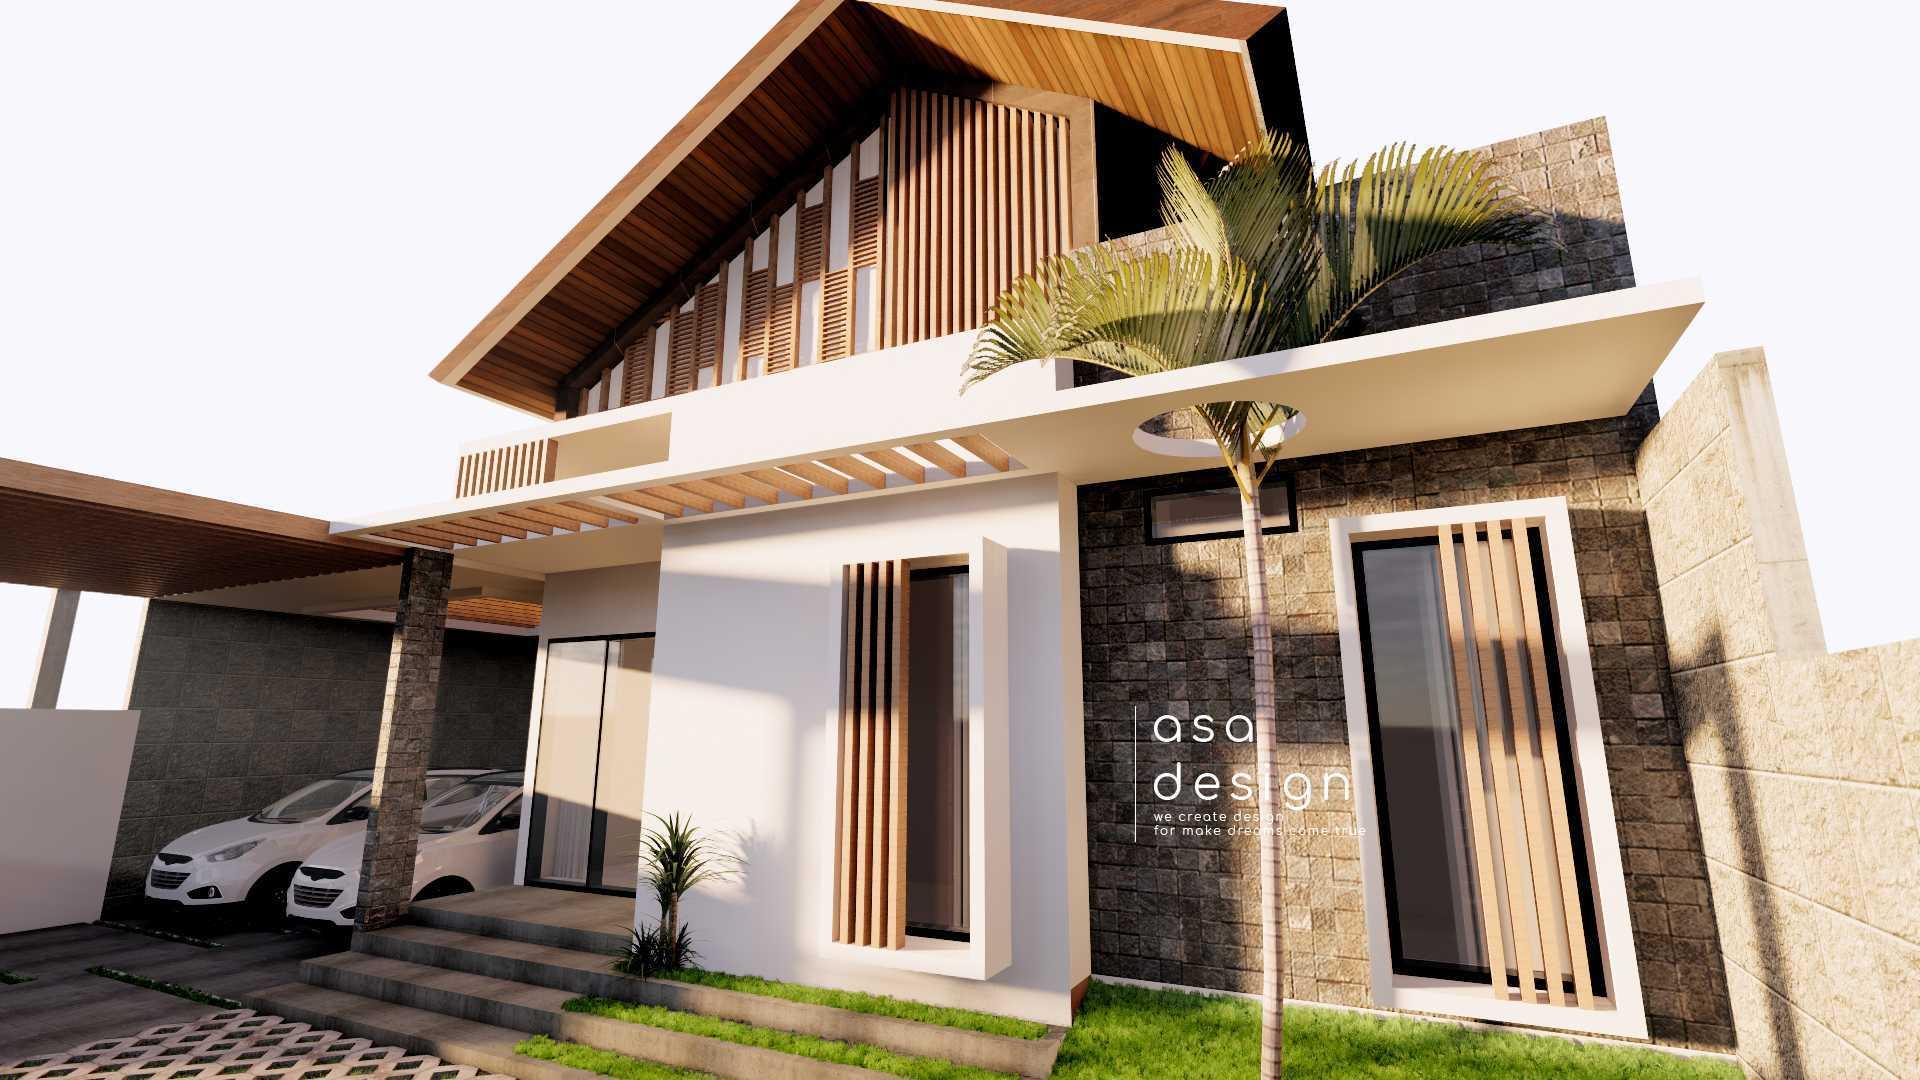 Asa Design Architect Griya Atap Miring Kediri, Jawa Timur, Indonesia Kediri, Jawa Timur, Indonesia Asa-Desain-Arsitek-Griya-Atap-Miring  125319